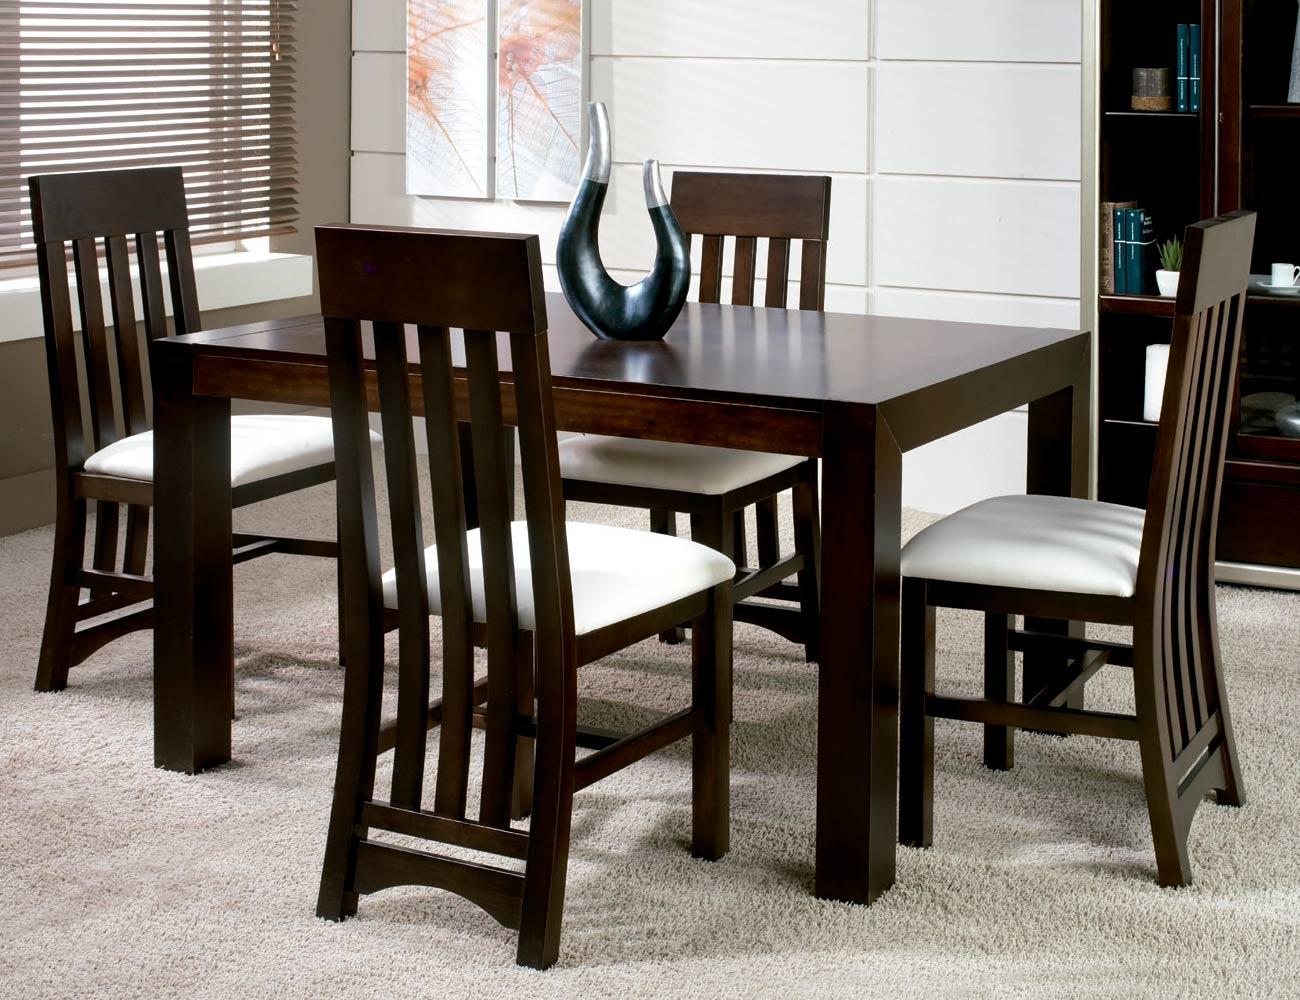 Composicion14 mesa sillas